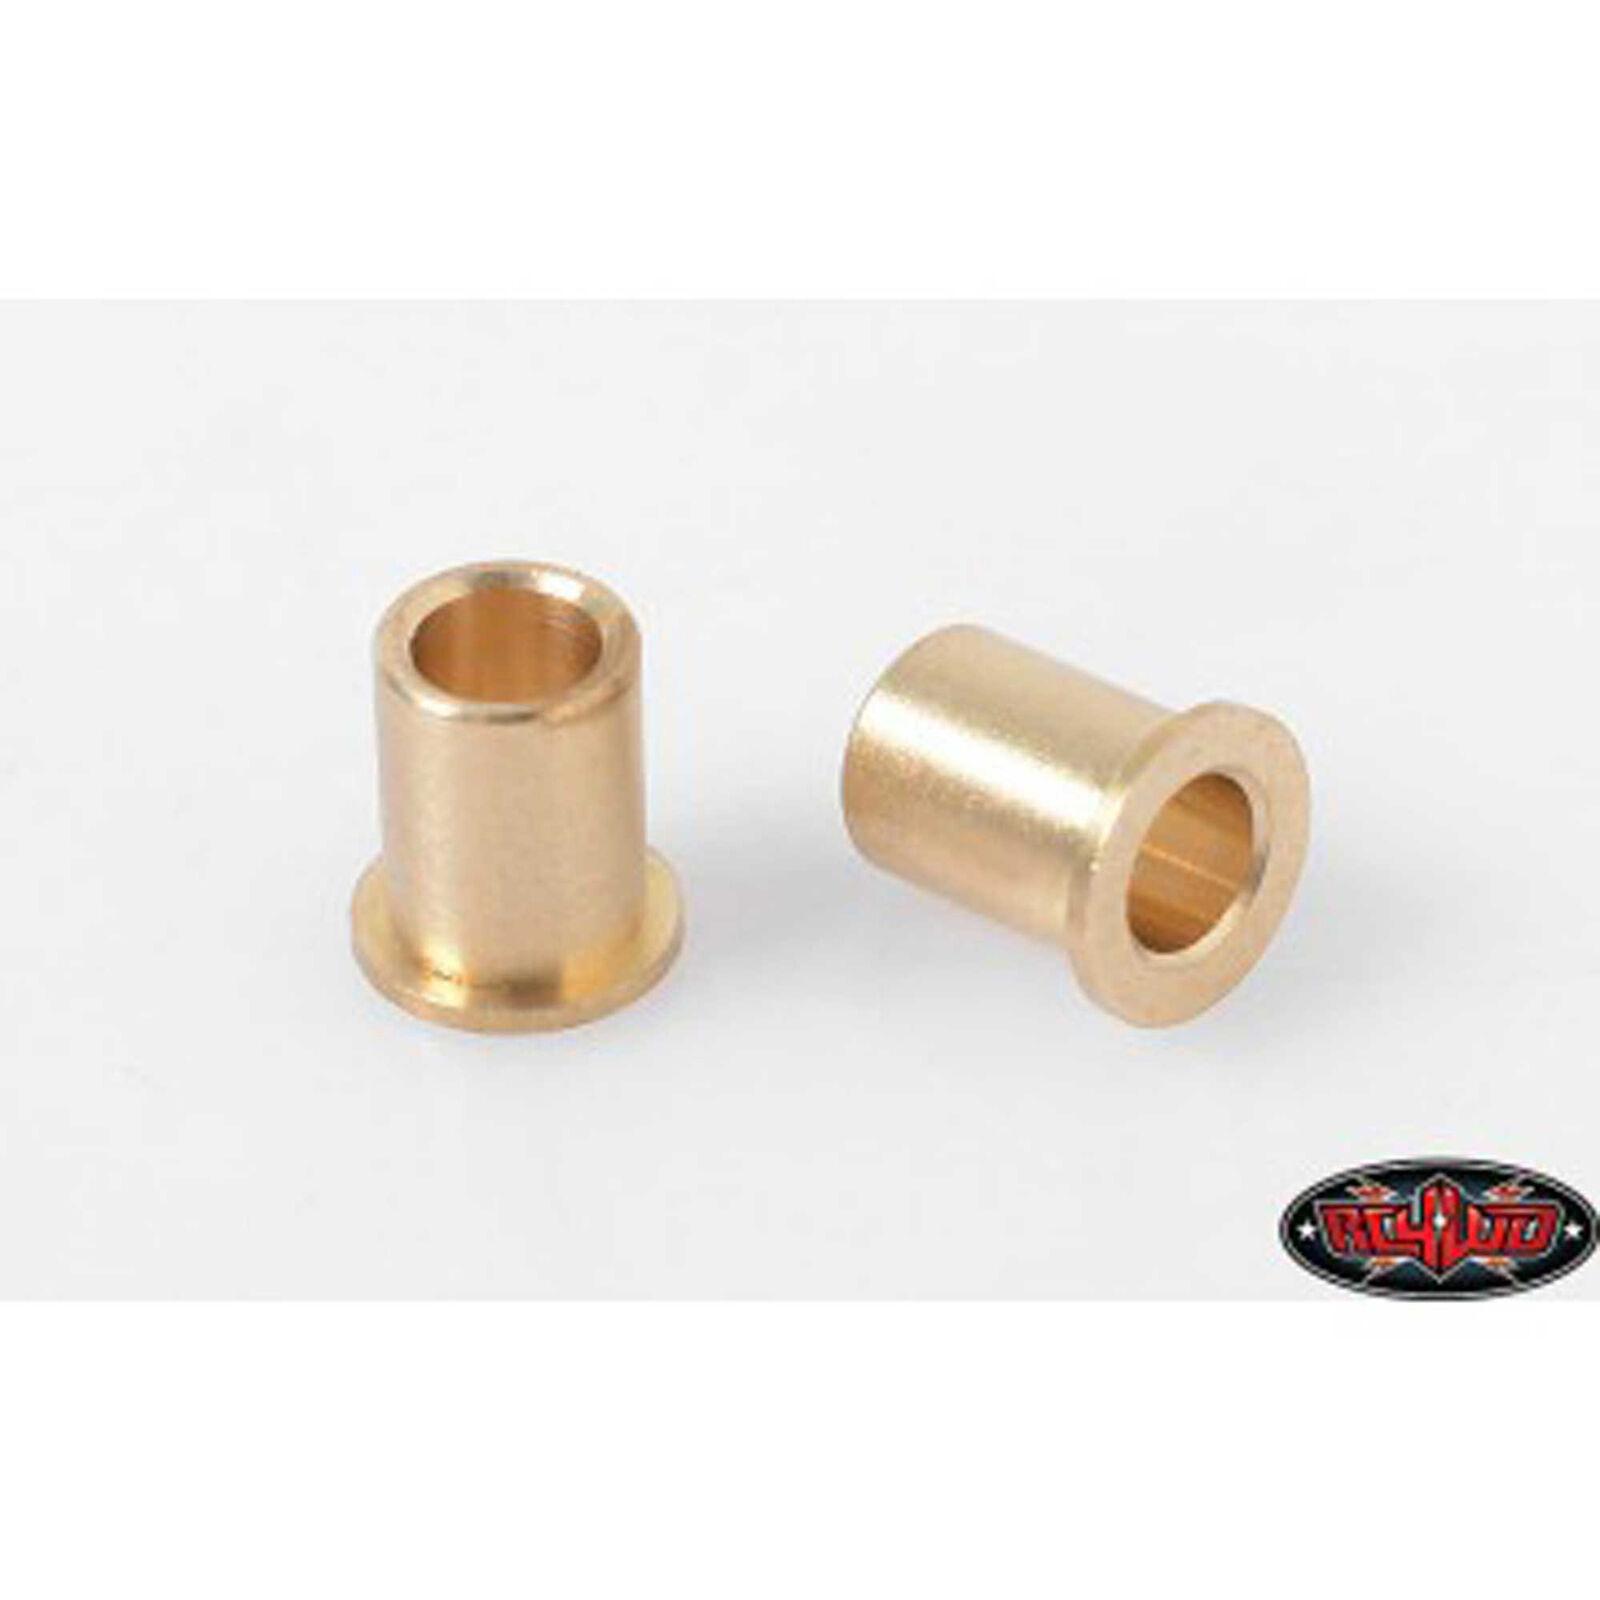 Brass Knuckle Bushings for D44 Axle (8)